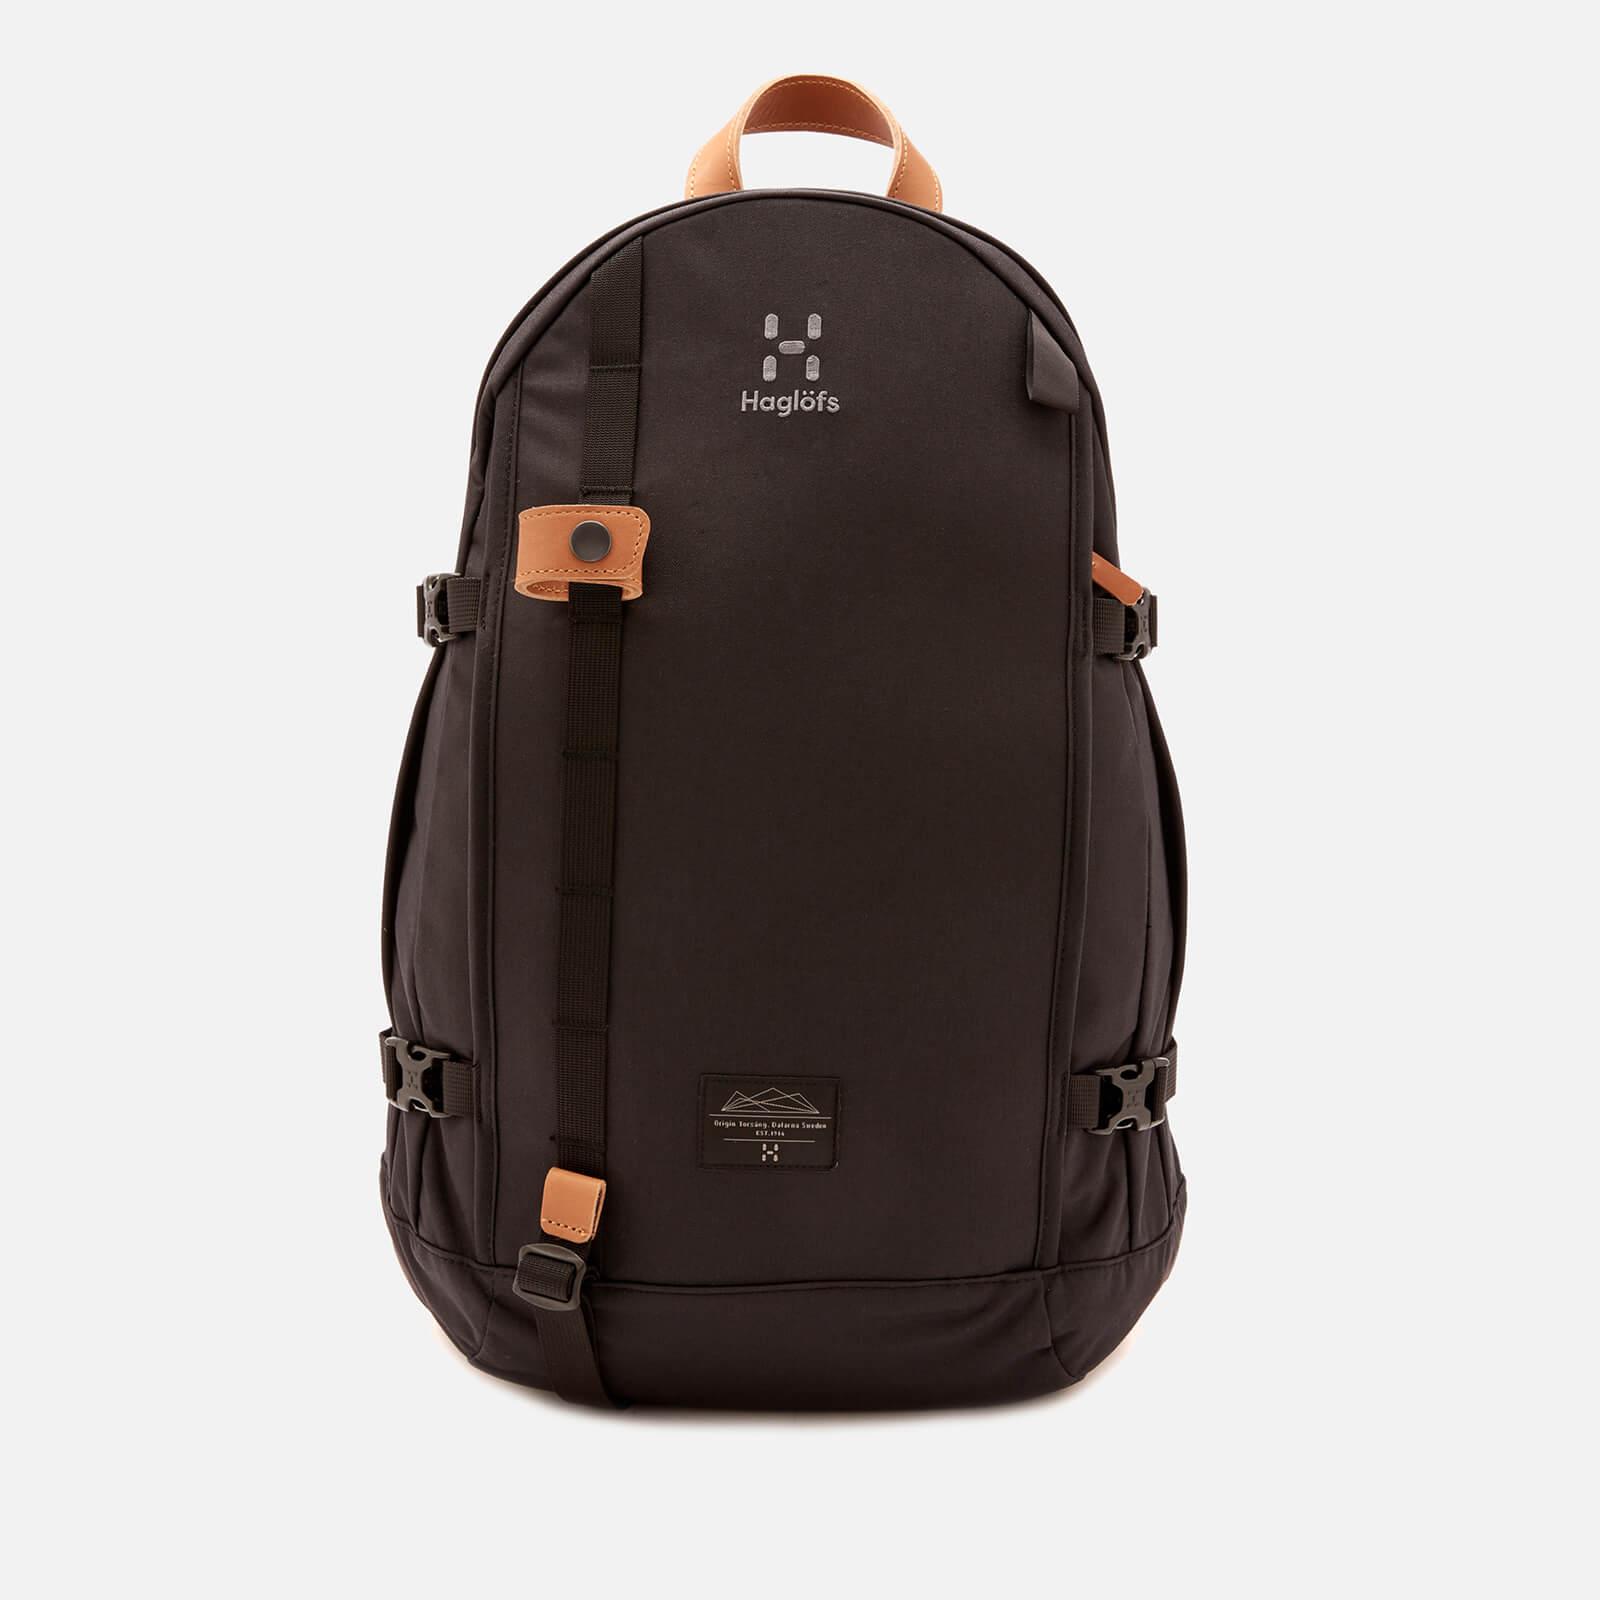 Haglofs Men's Tight Malung Large Backpack - True Black